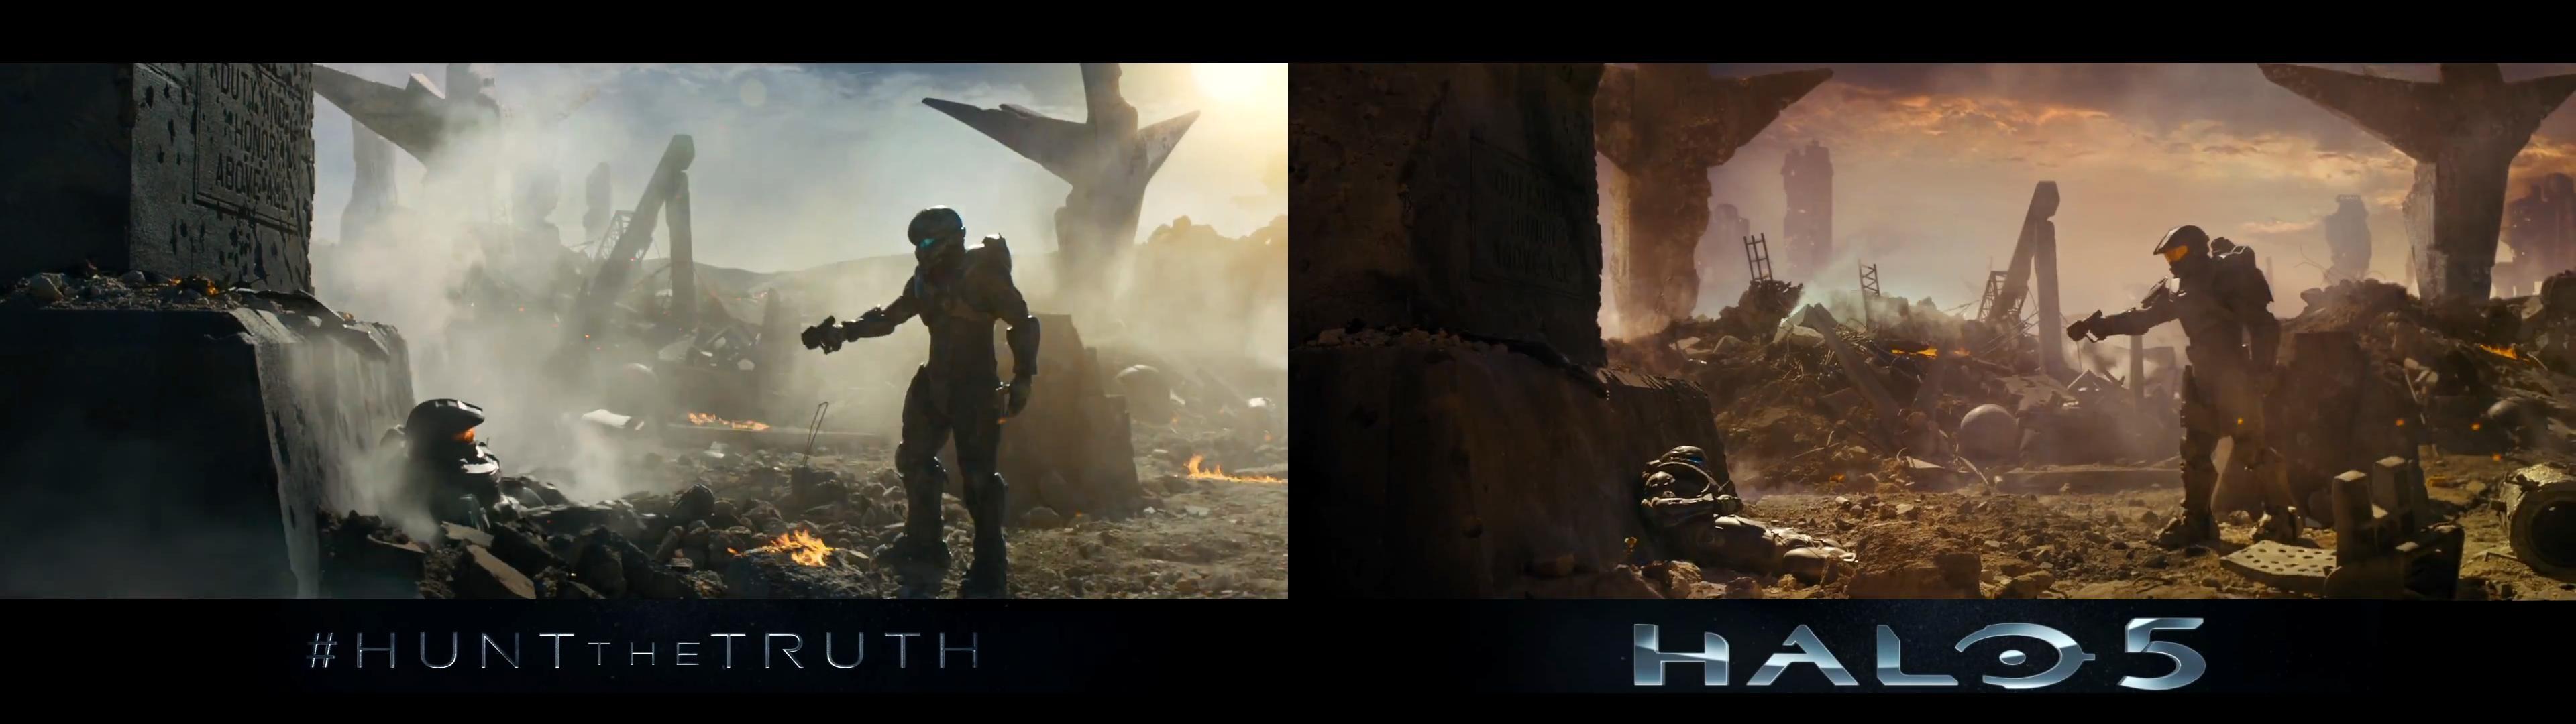 Halo 5 Dual Monitor Wallpaper (59+ images)